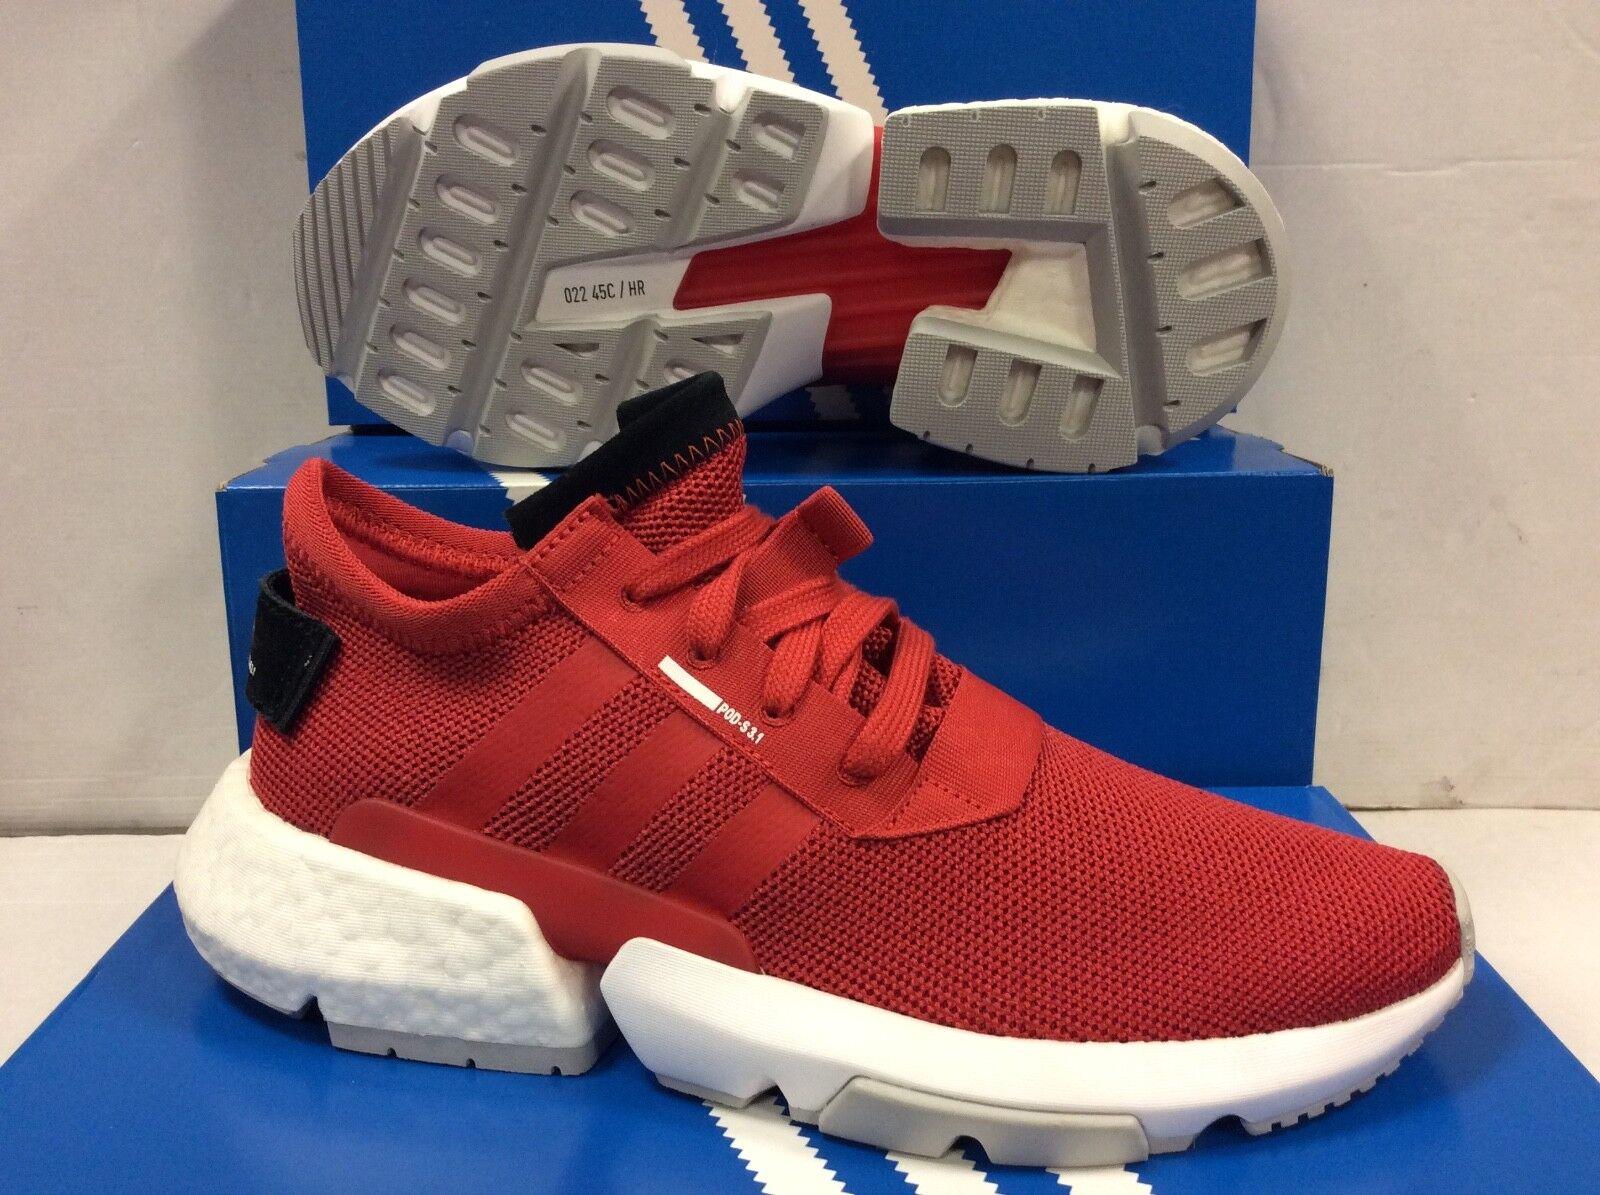 Adidas Originals POD-S3.1 Unisex Junior's Scarpe Da Ginnastica DB2891, Taglia  EUR 36 | Menu elegante e robusto  | Maschio/Ragazze Scarpa